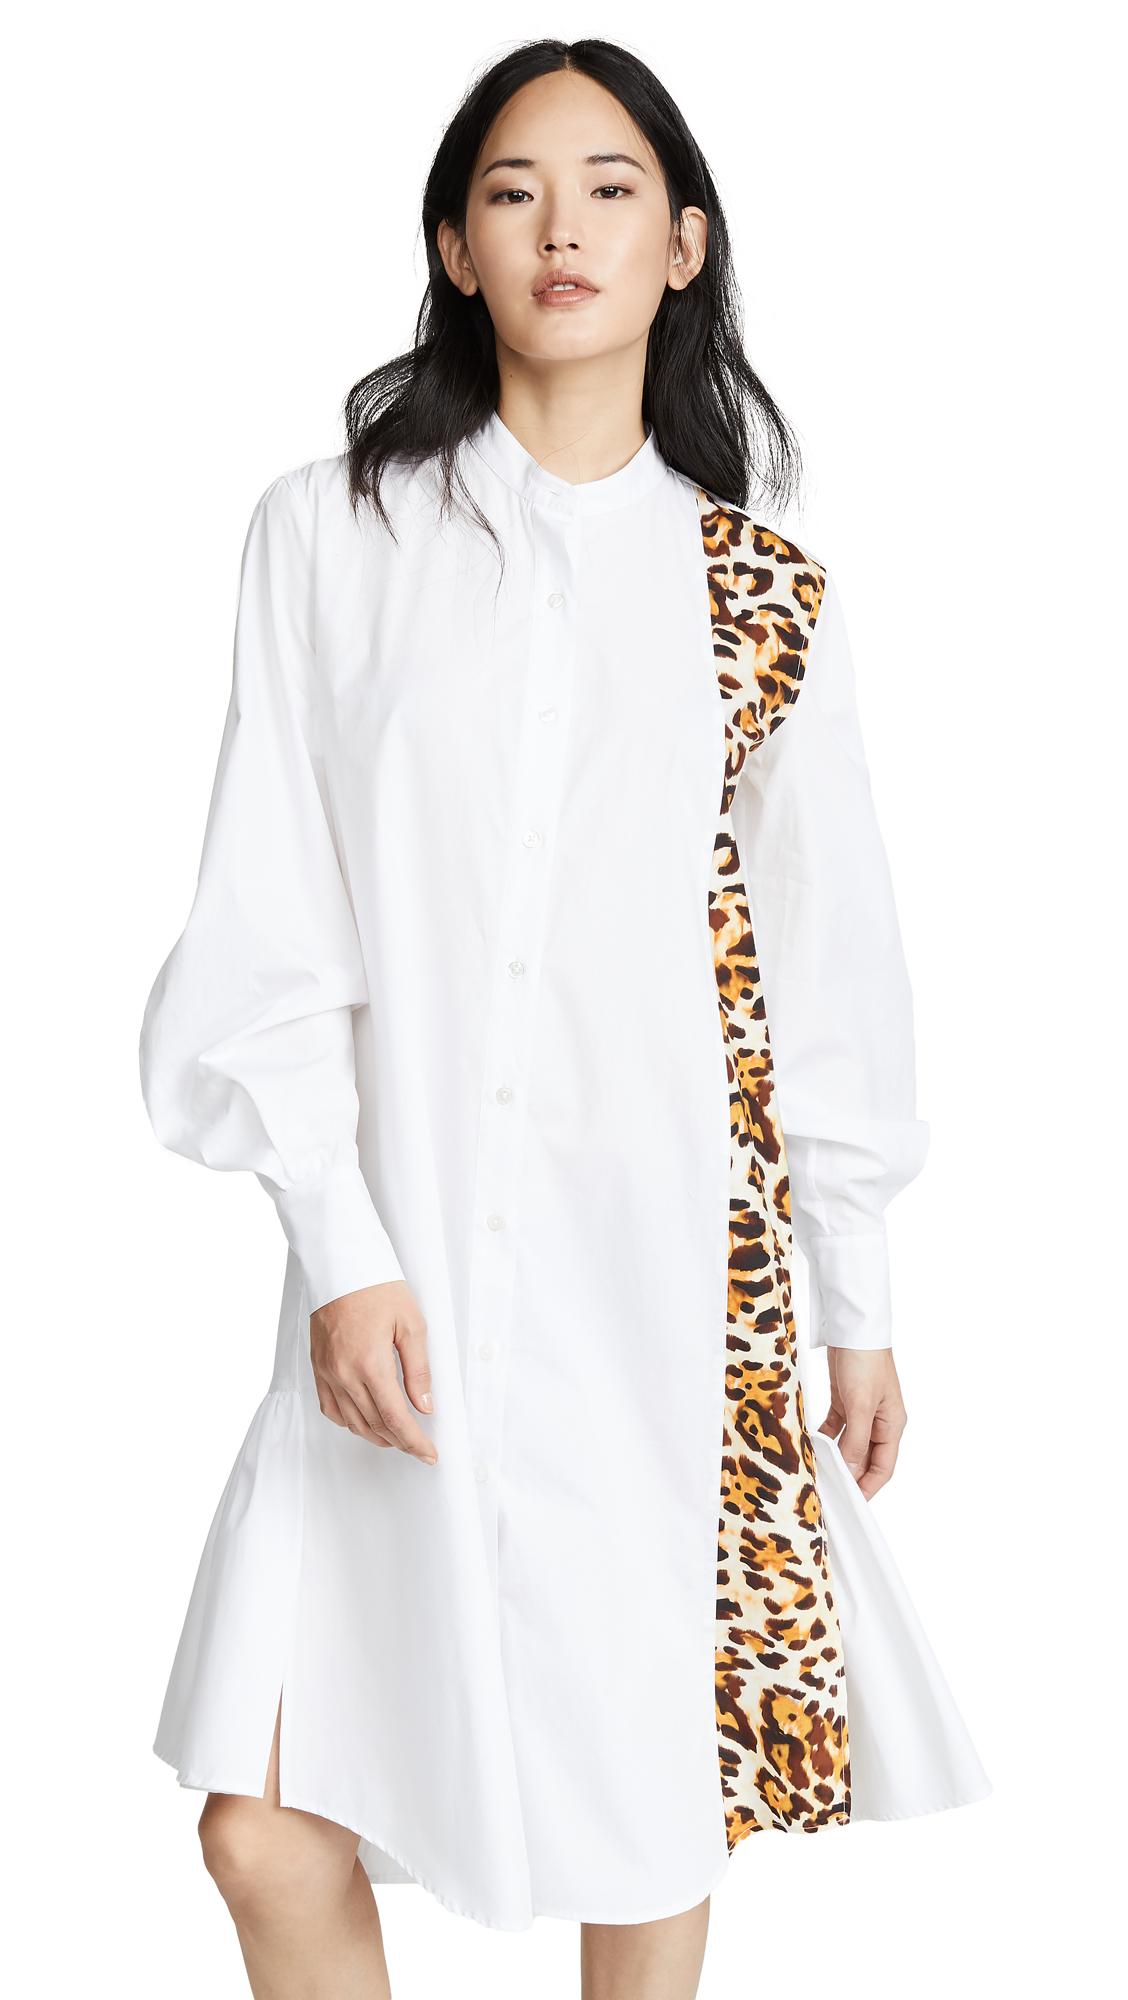 CF Goldman Peplum Shirtdress - White/Leopard